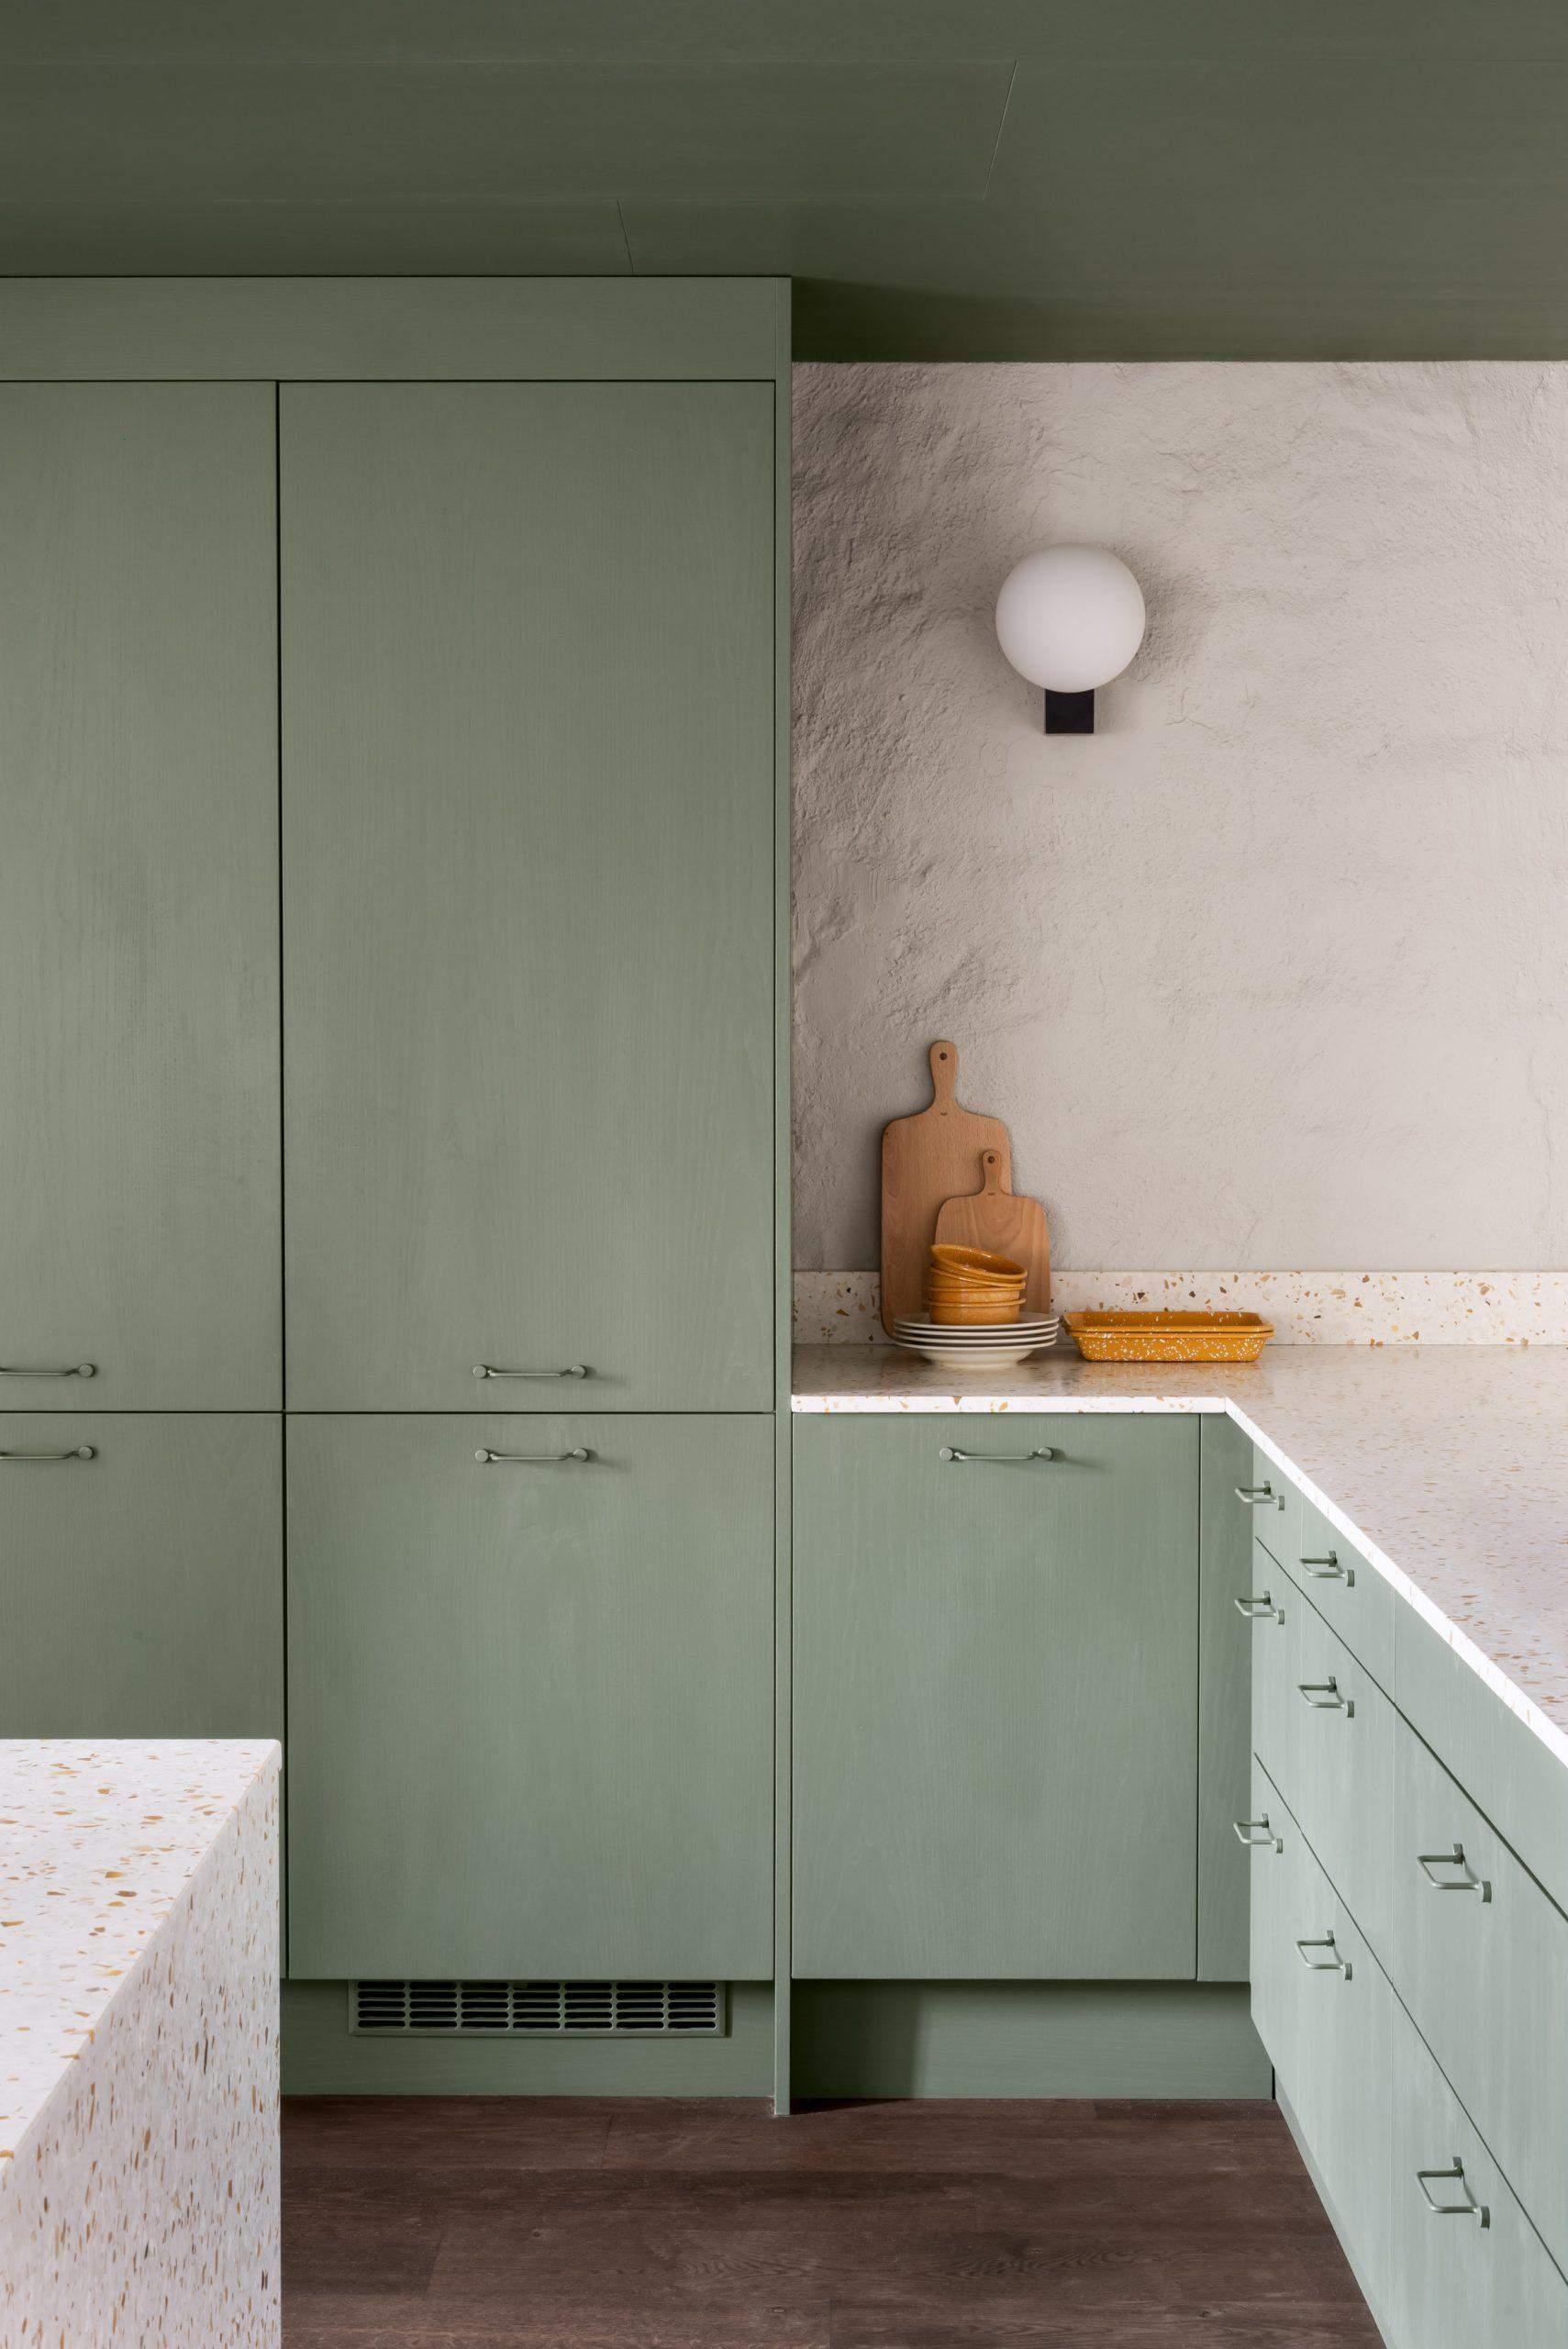 Кухня в шалфейно-зеленом цвете